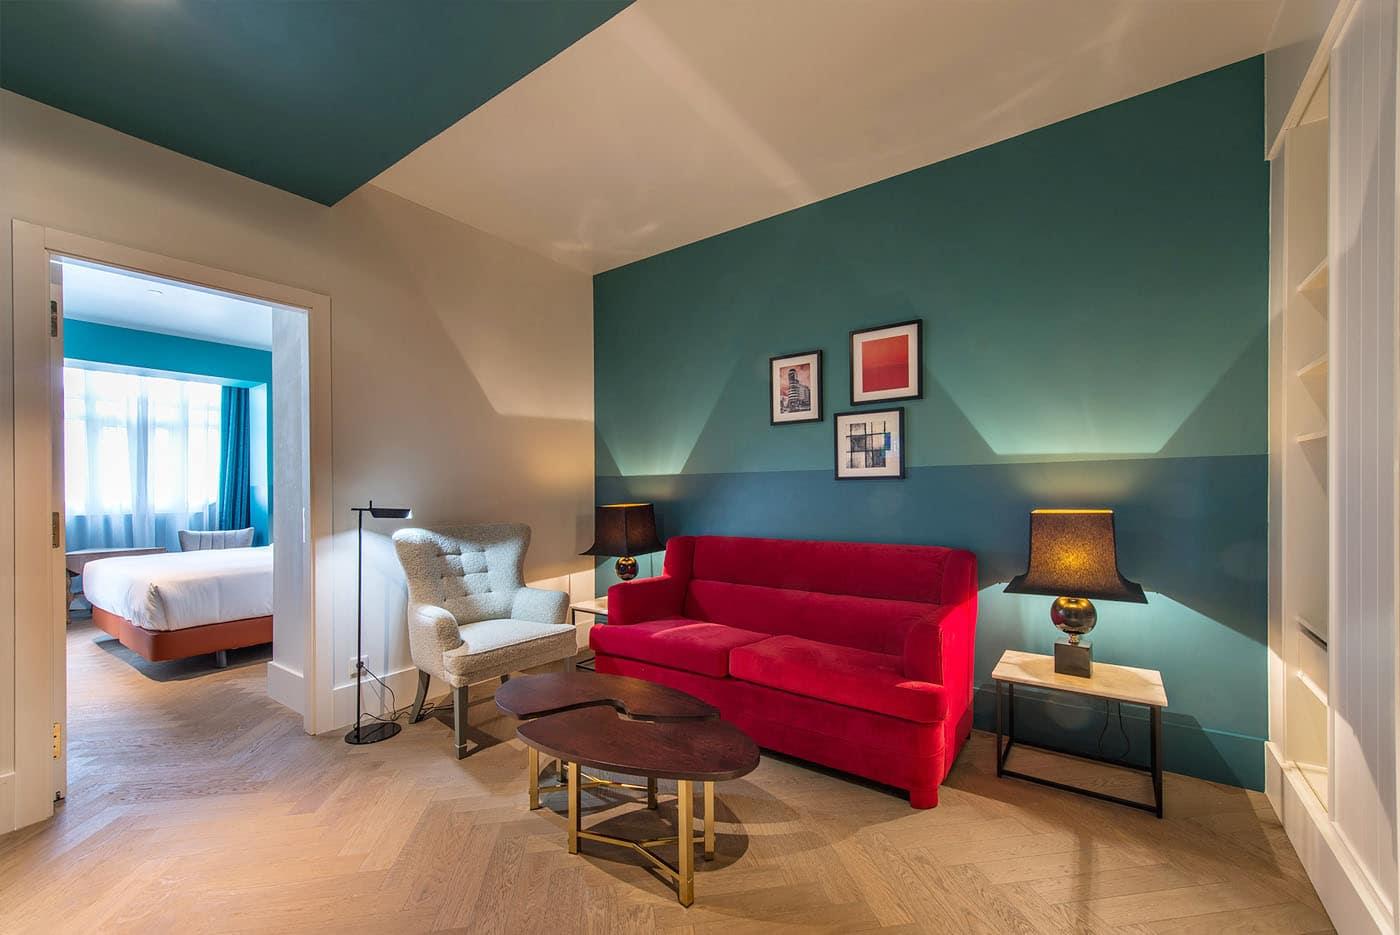 hotel-vincci-the-mint-adolfo-gosalvez-hoteles-panoramicos